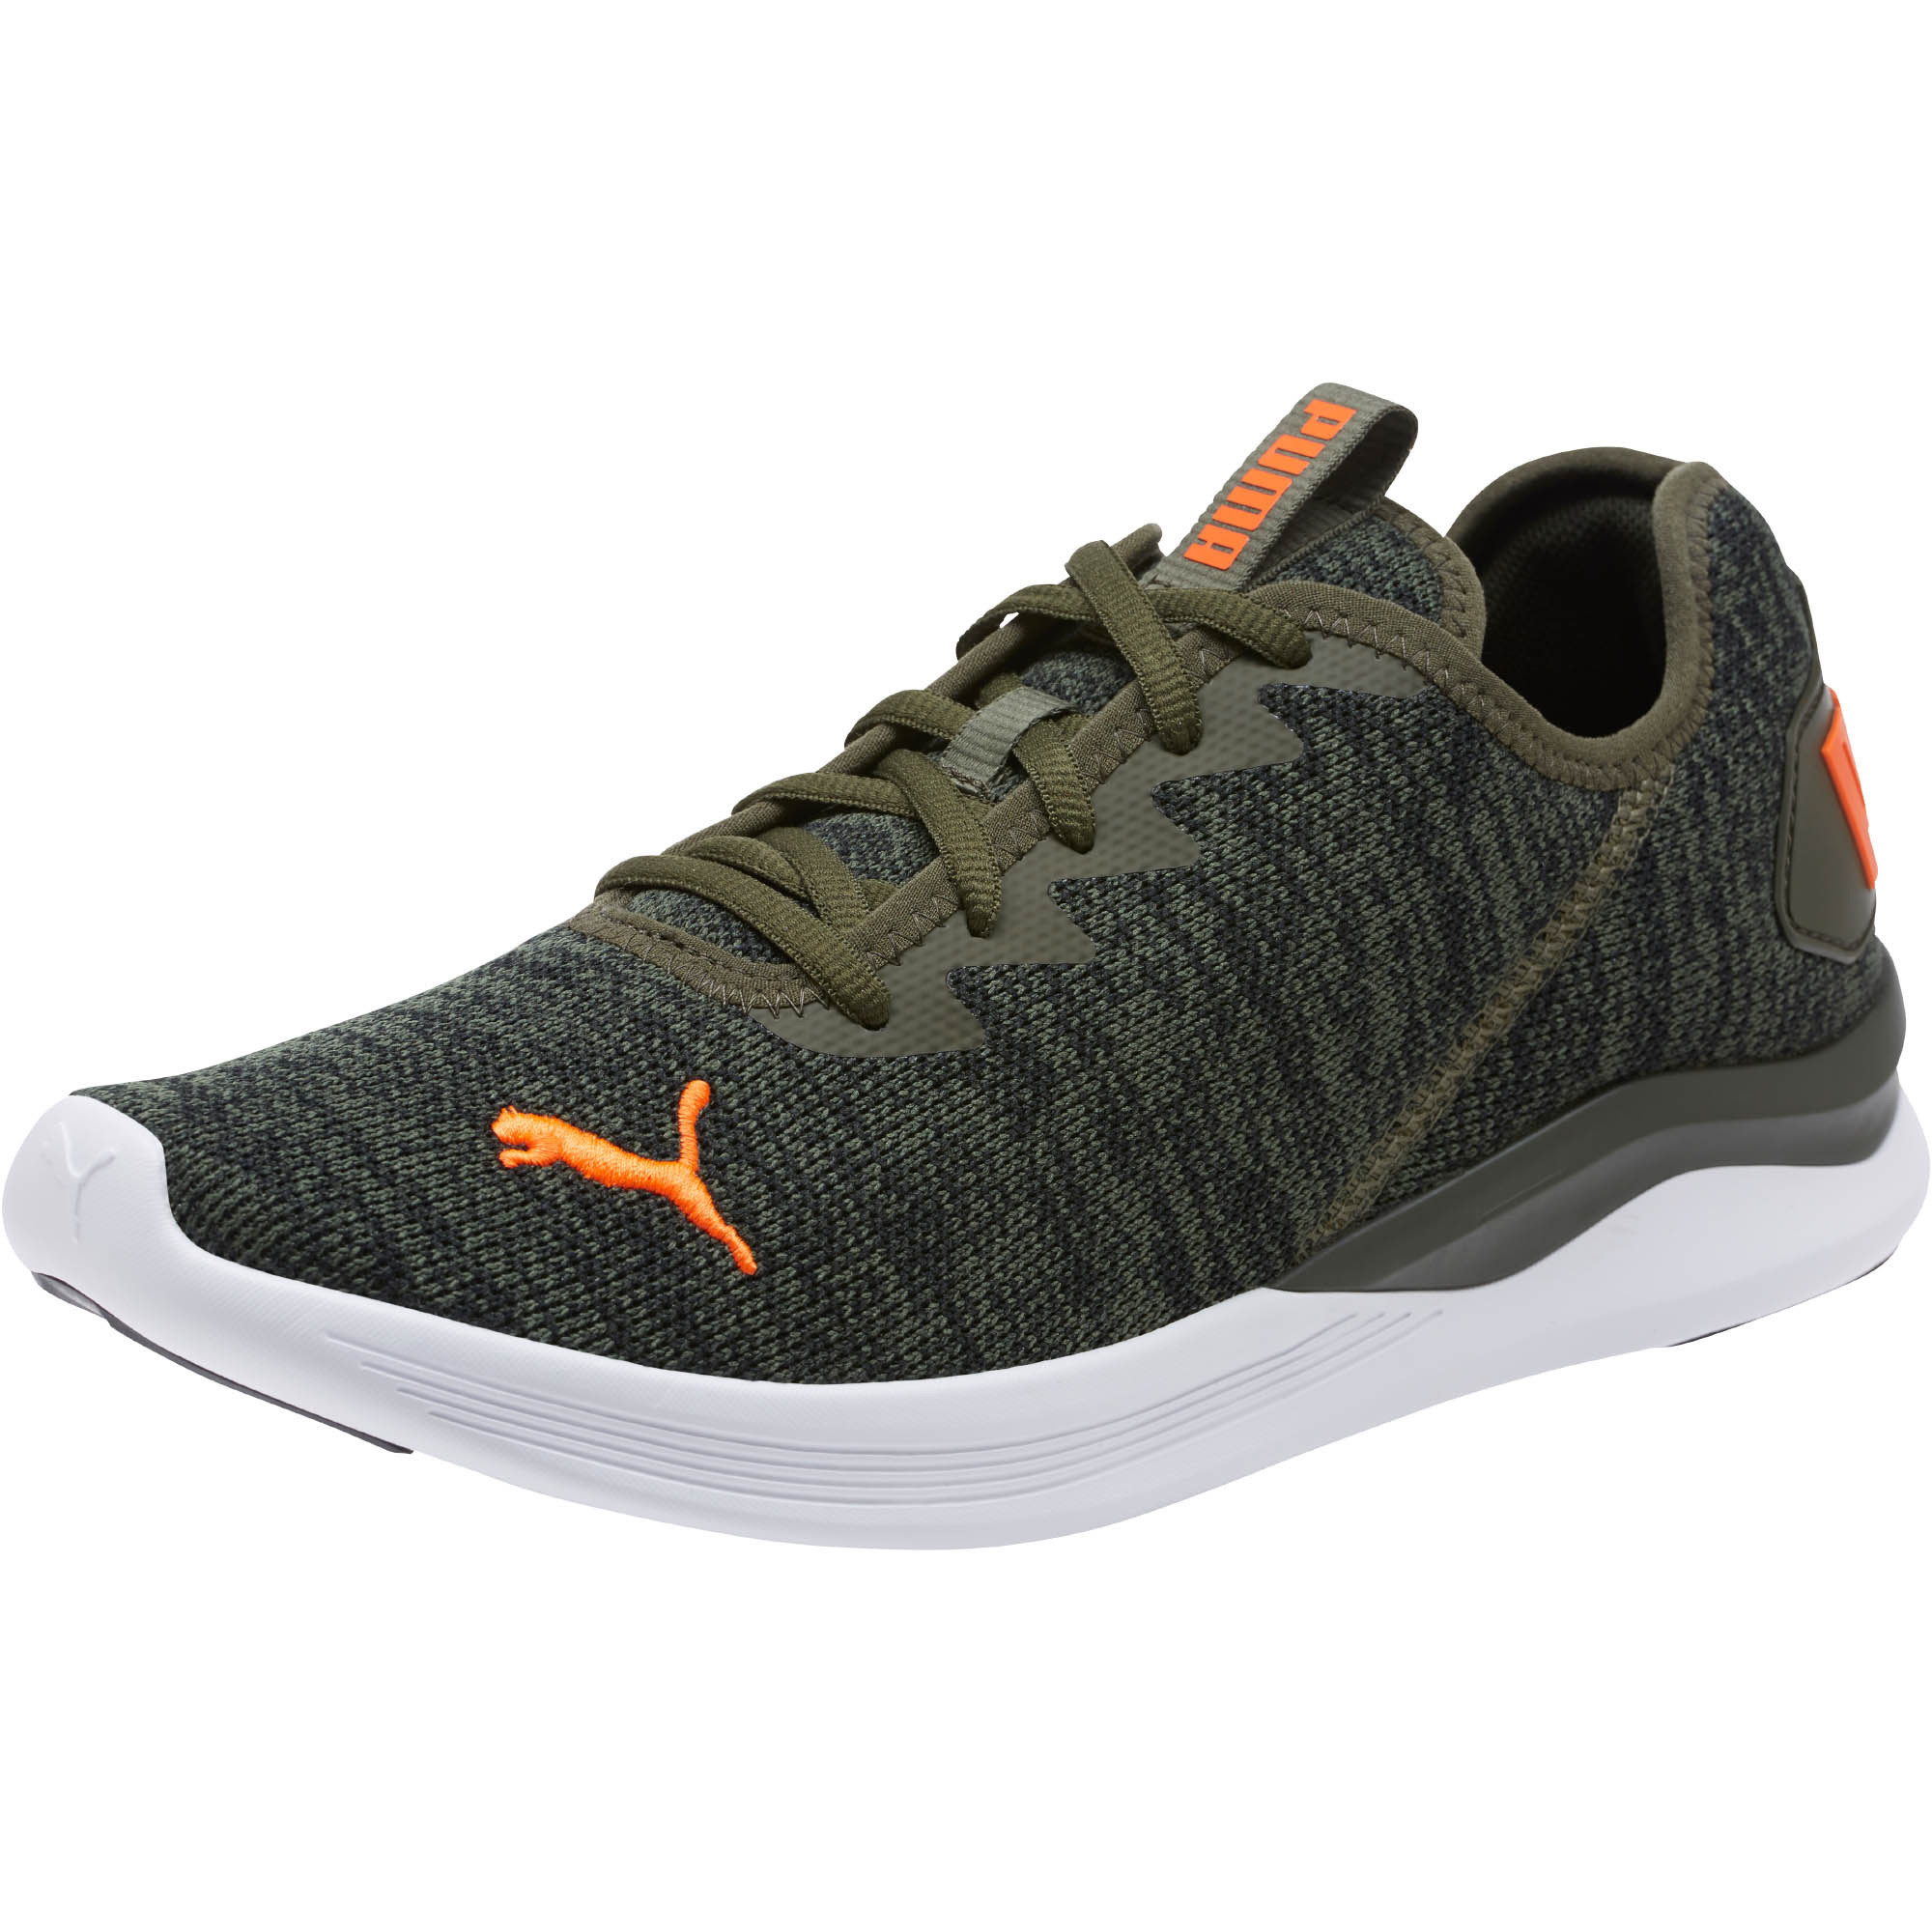 PUMA-Ballast-Men-039-s-Running-Shoes-Men-Shoe-Running thumbnail 4